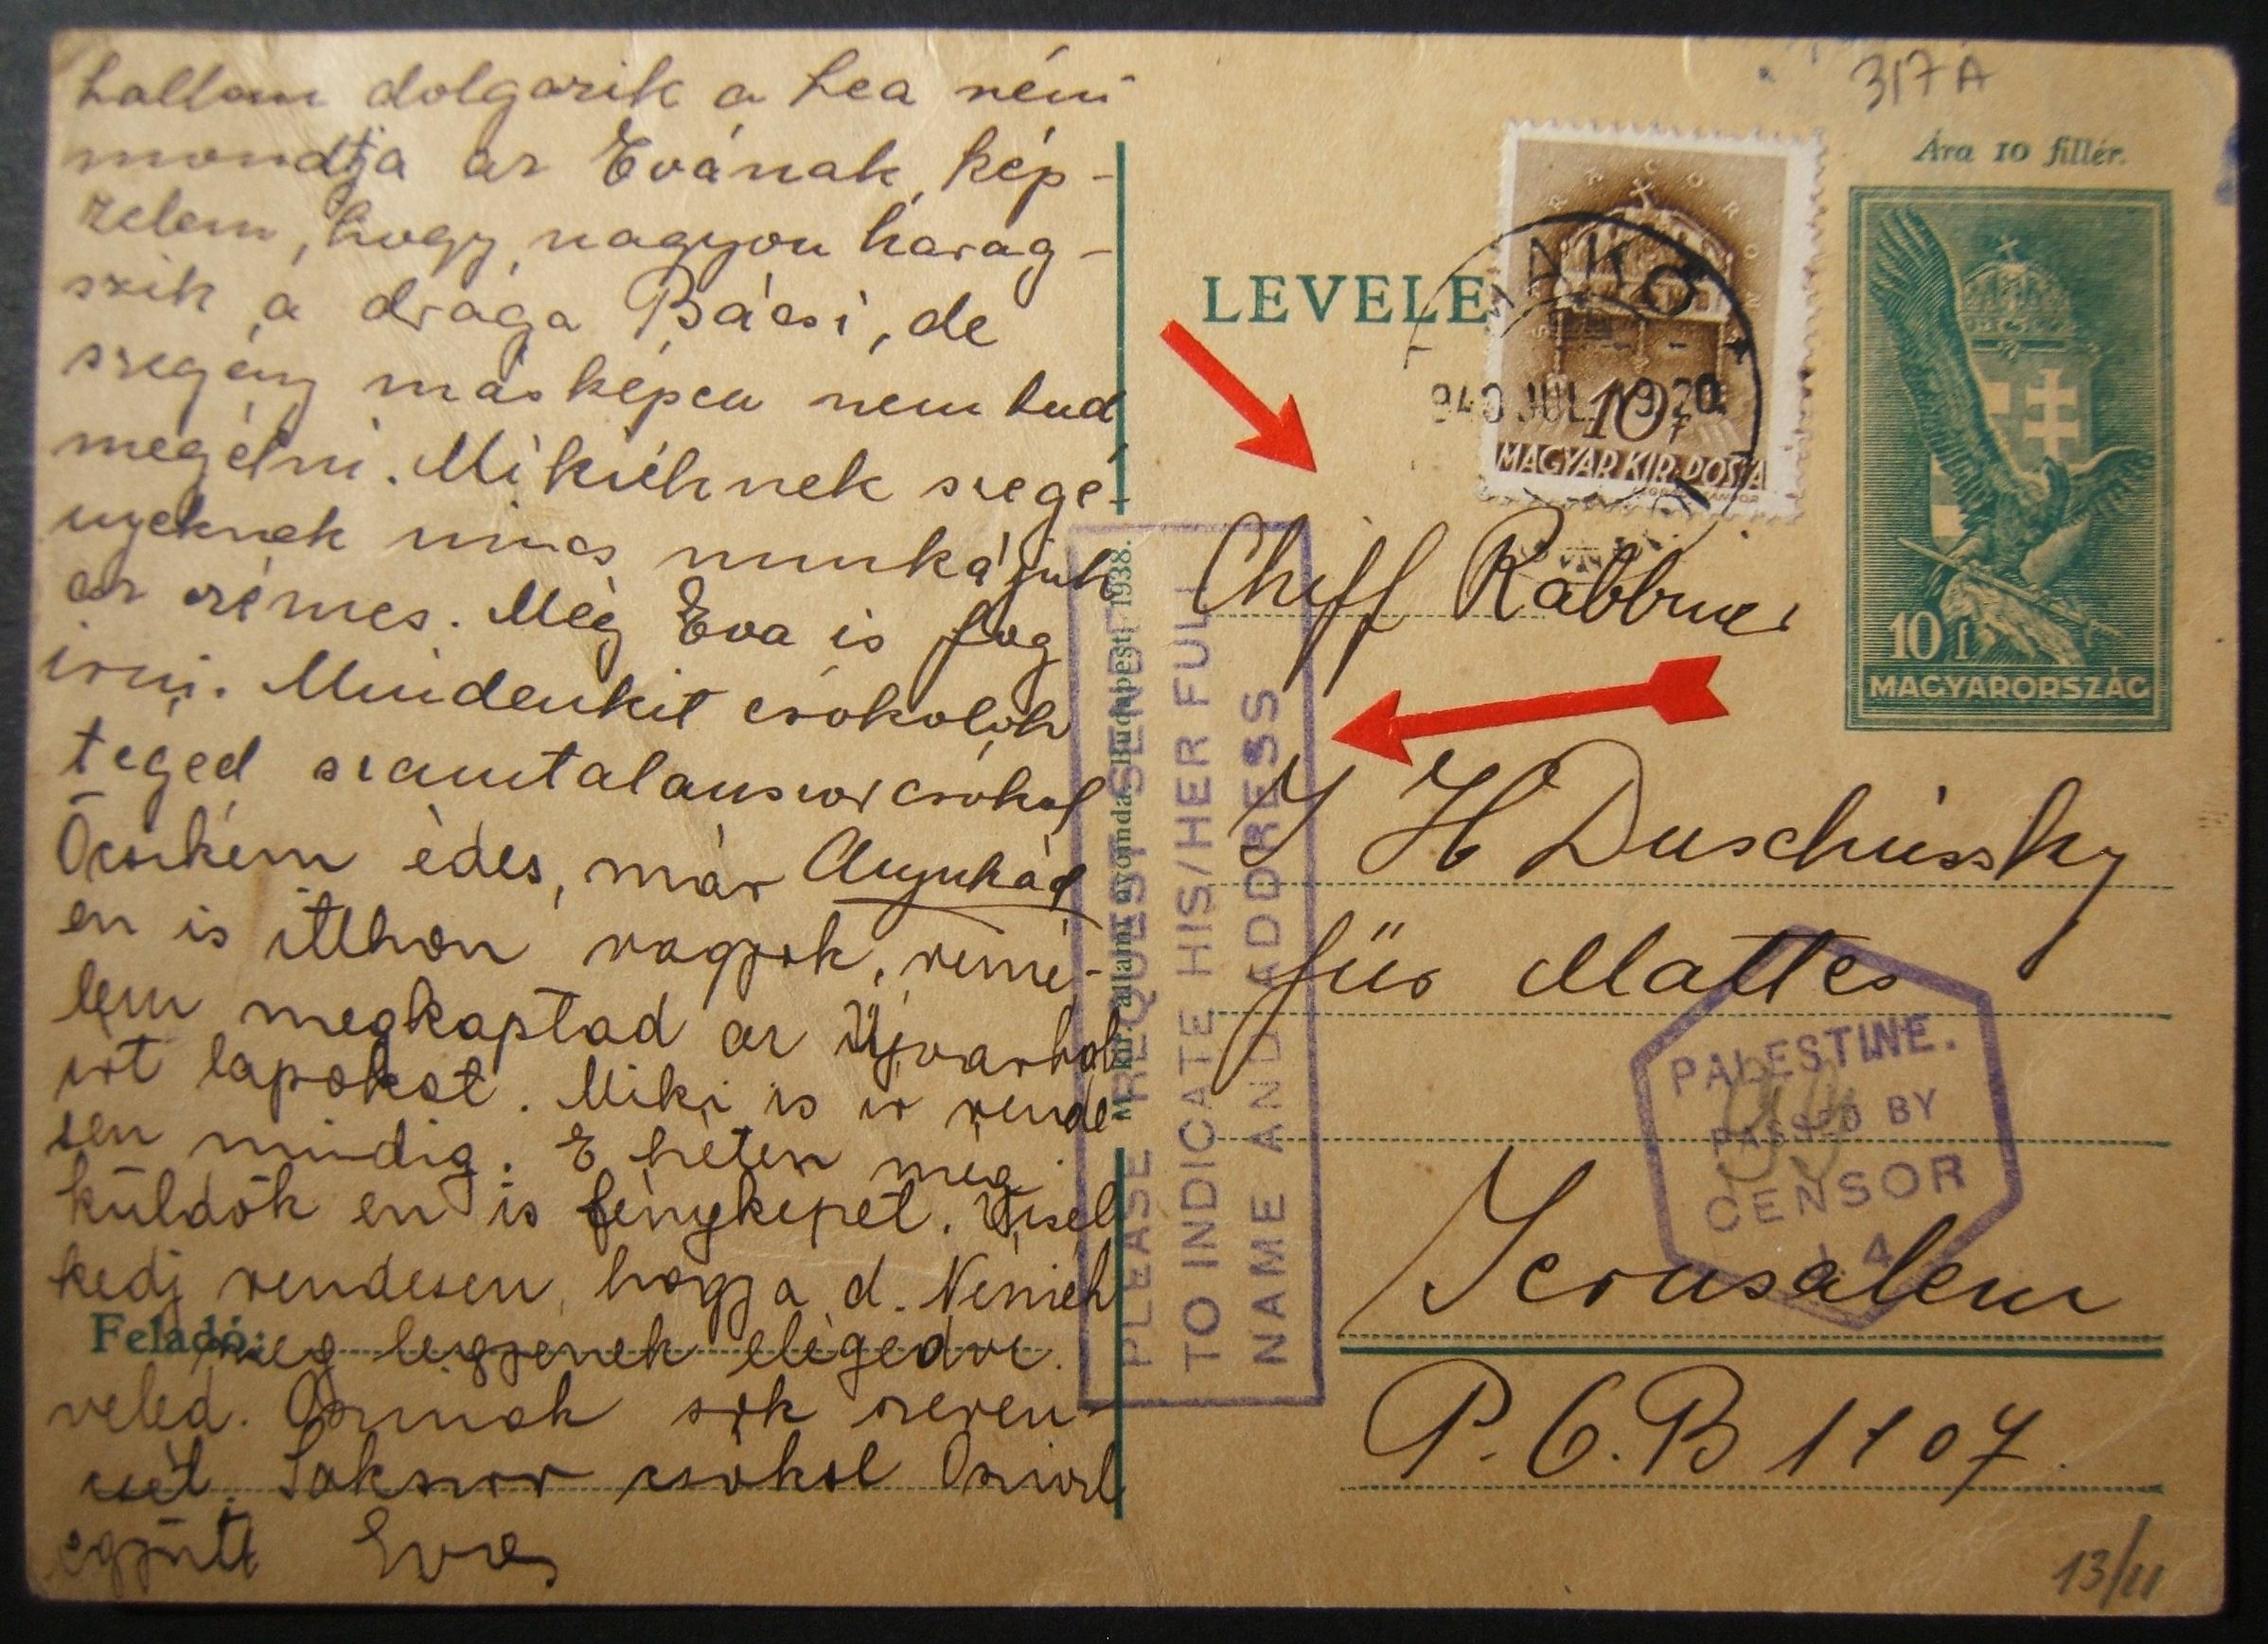 WWII / Holocaust era mail from Rabbi Dushinsky in HUNGARY to JERUSALEM، no return address